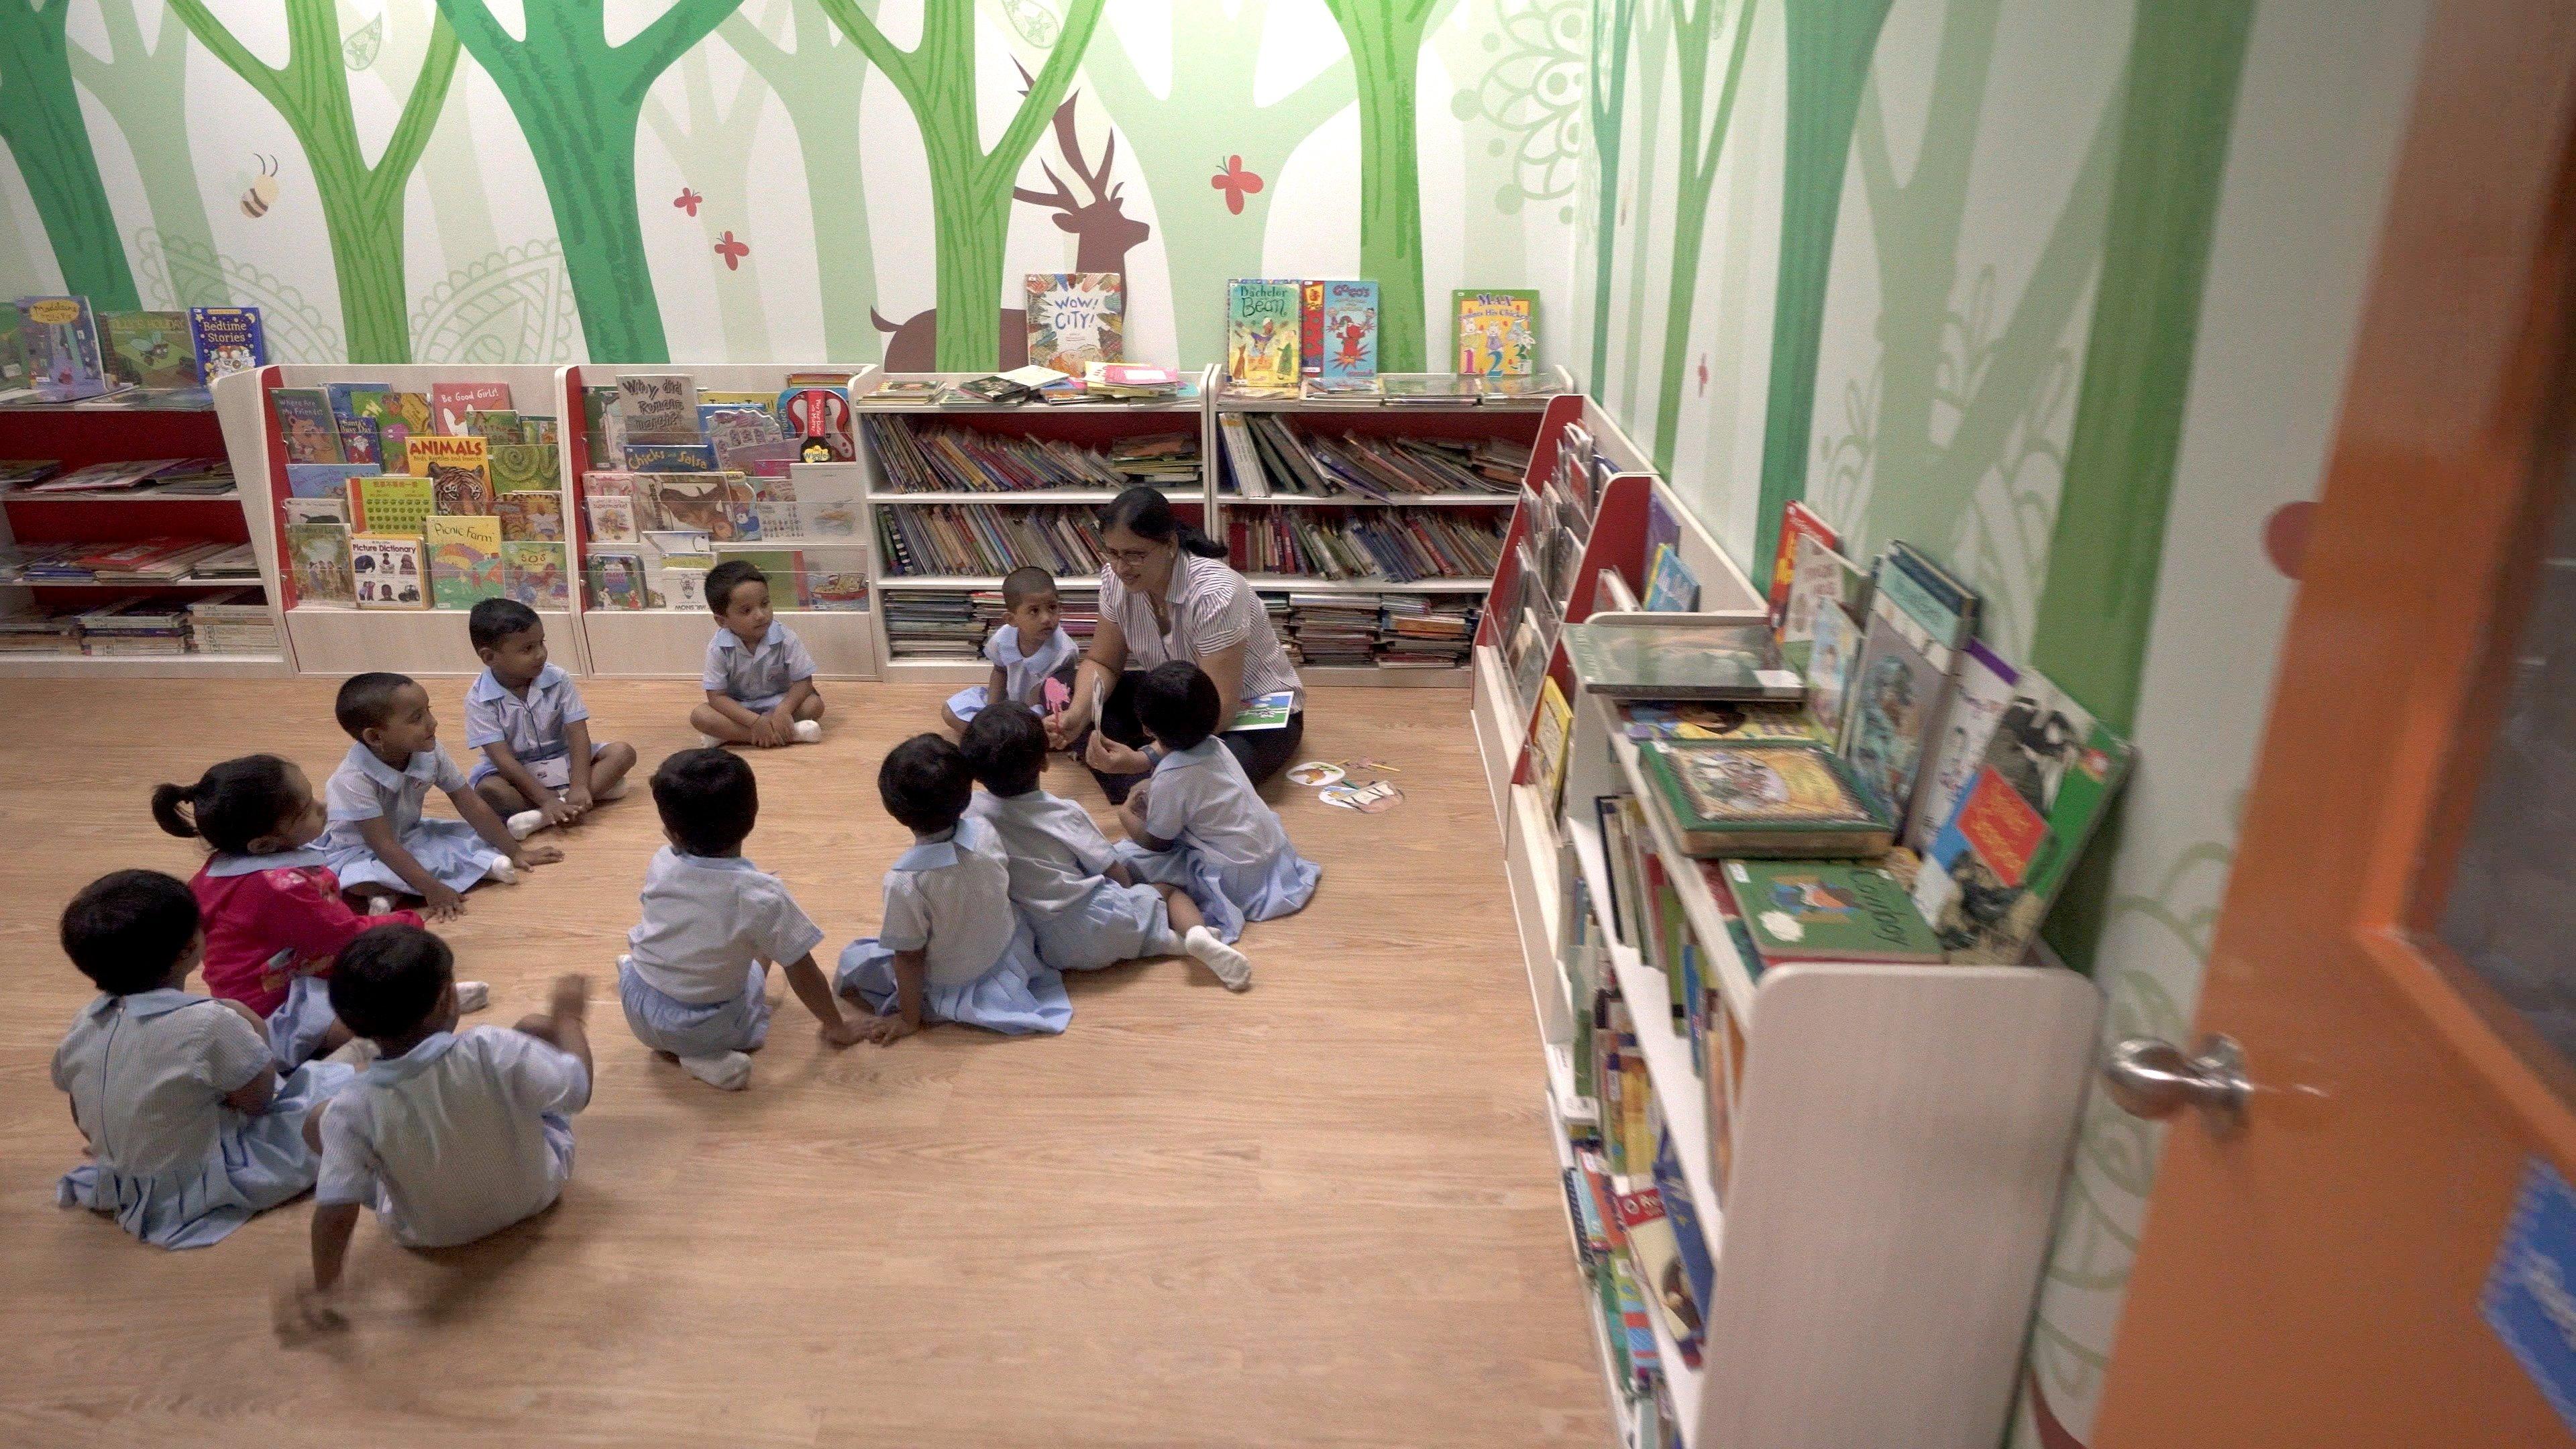 GIIS_Preschool role of play